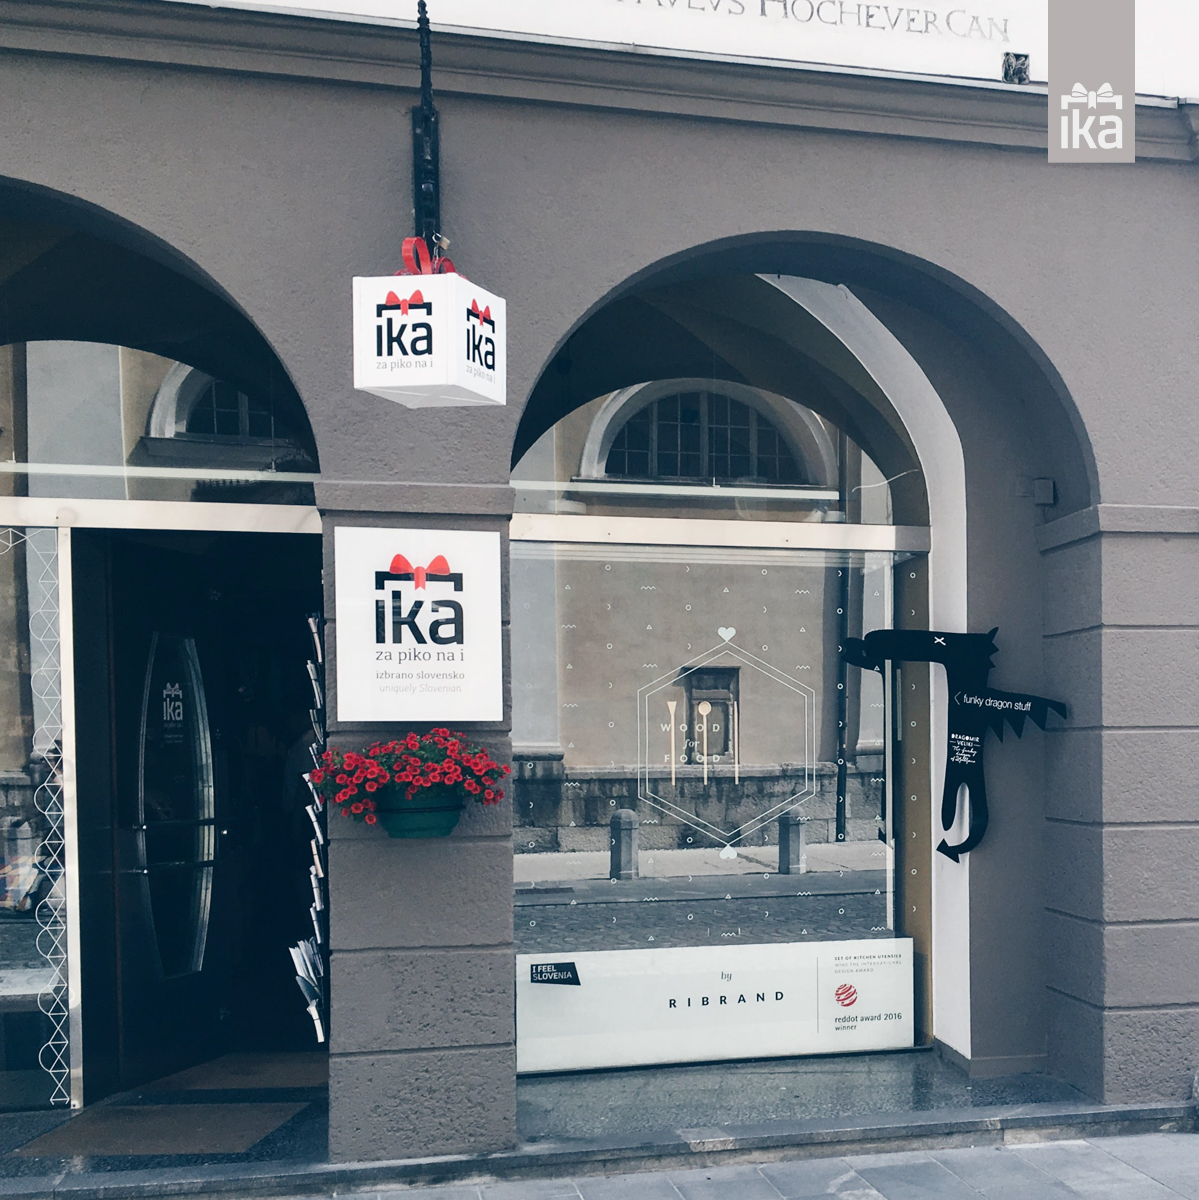 Izložba RIBRAND   07/2016   Trgovina IKA